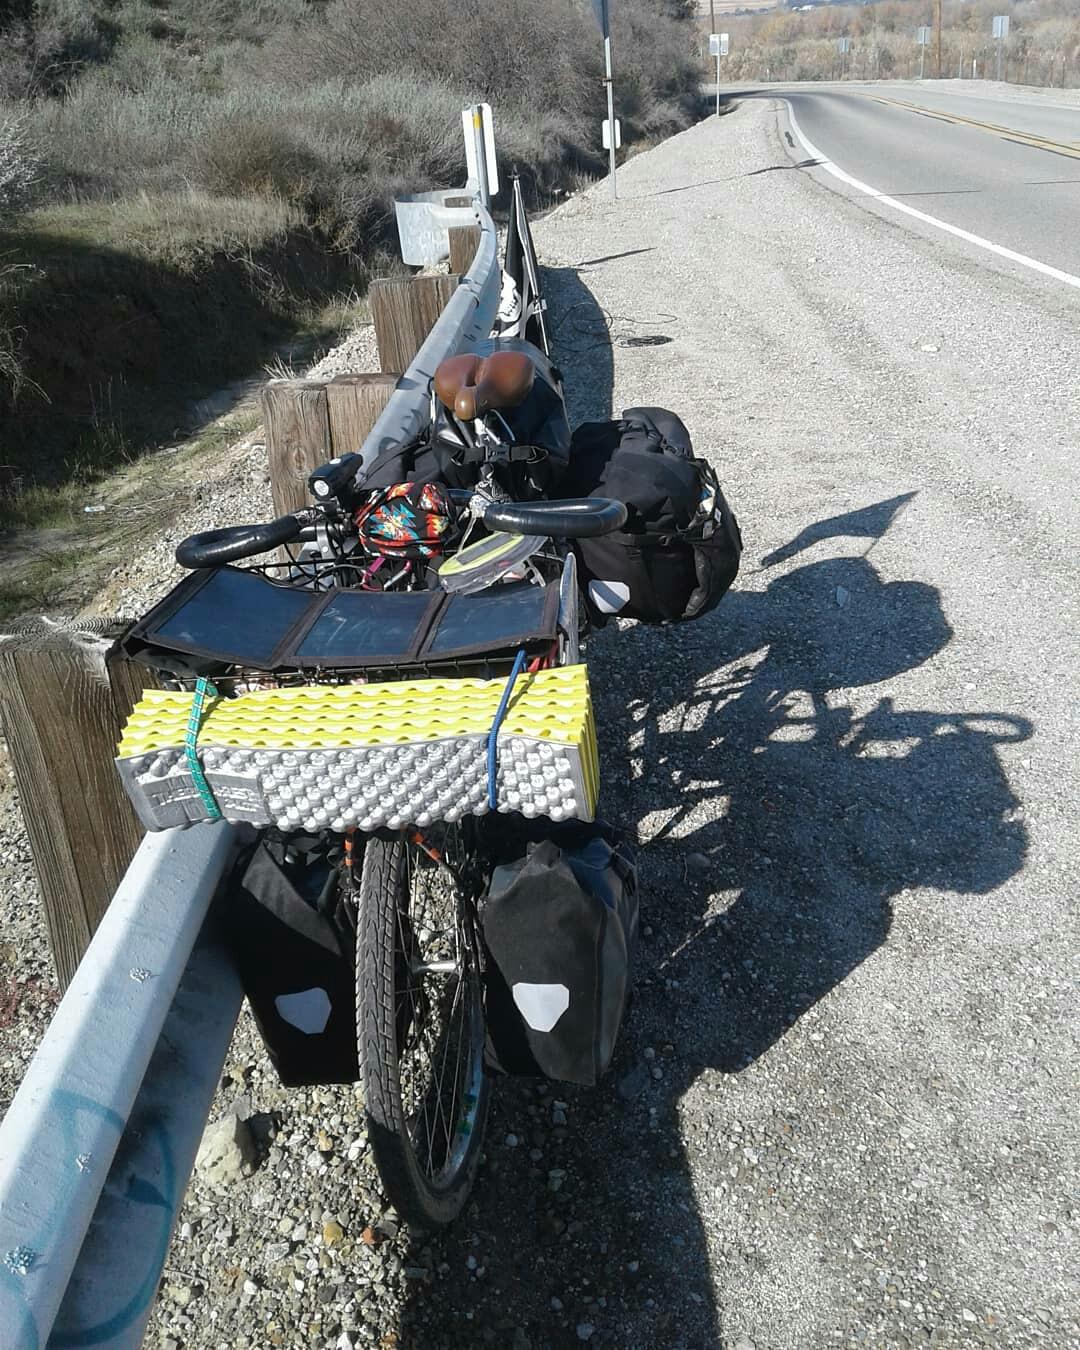 bikepunky-1547406292619-jpg.48543_FIRST EVER BIKE TOUR (PICS)_Bike Touring_Squat the Planet_11:08 AM